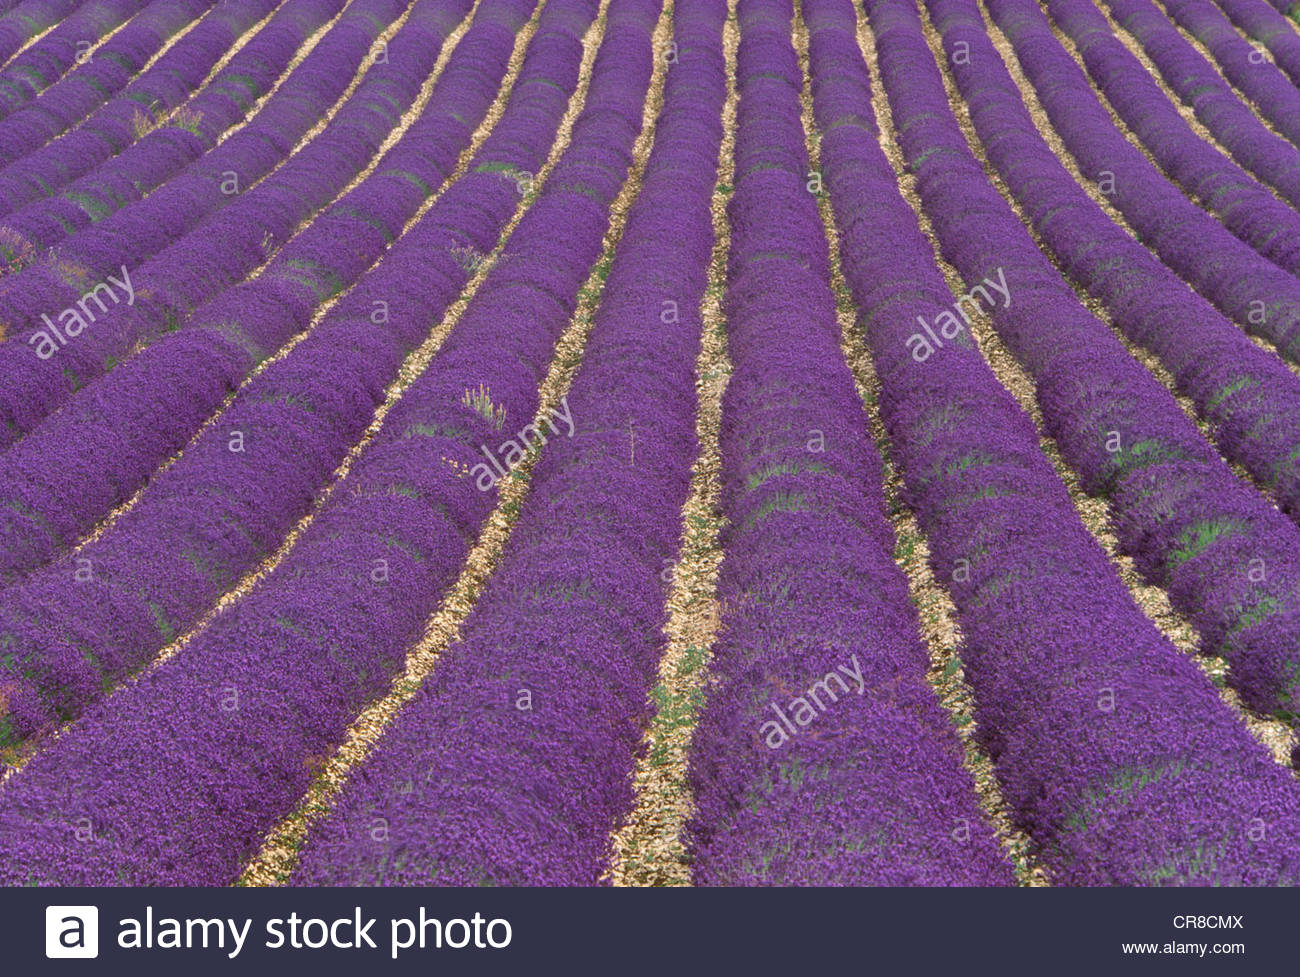 Lavender fields, Sault region, Provence, France - Stock Image